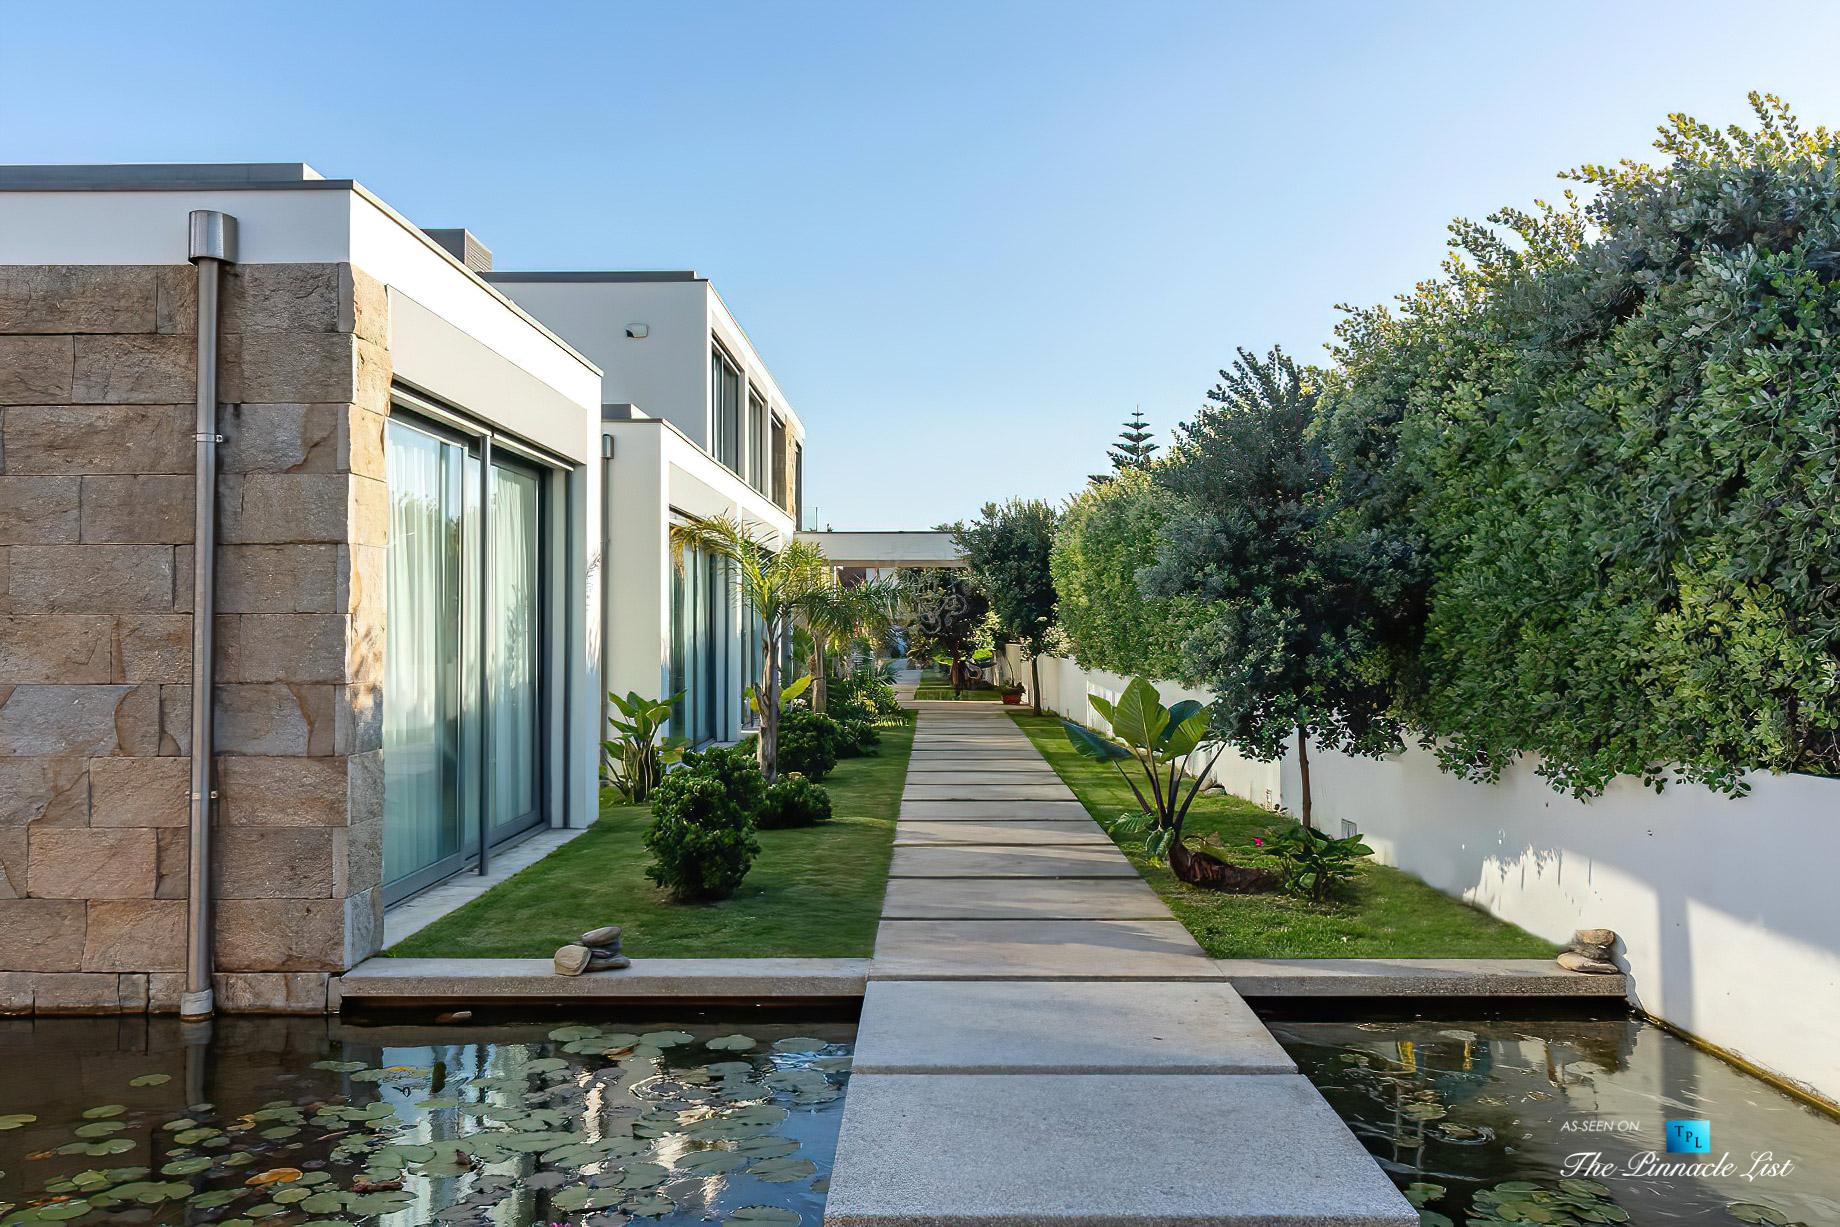 Francelos Beach Luxury T5 Villa – Porto, Portugal – Exterior Pond Walkway – Luxury Real Estate – Modern Home